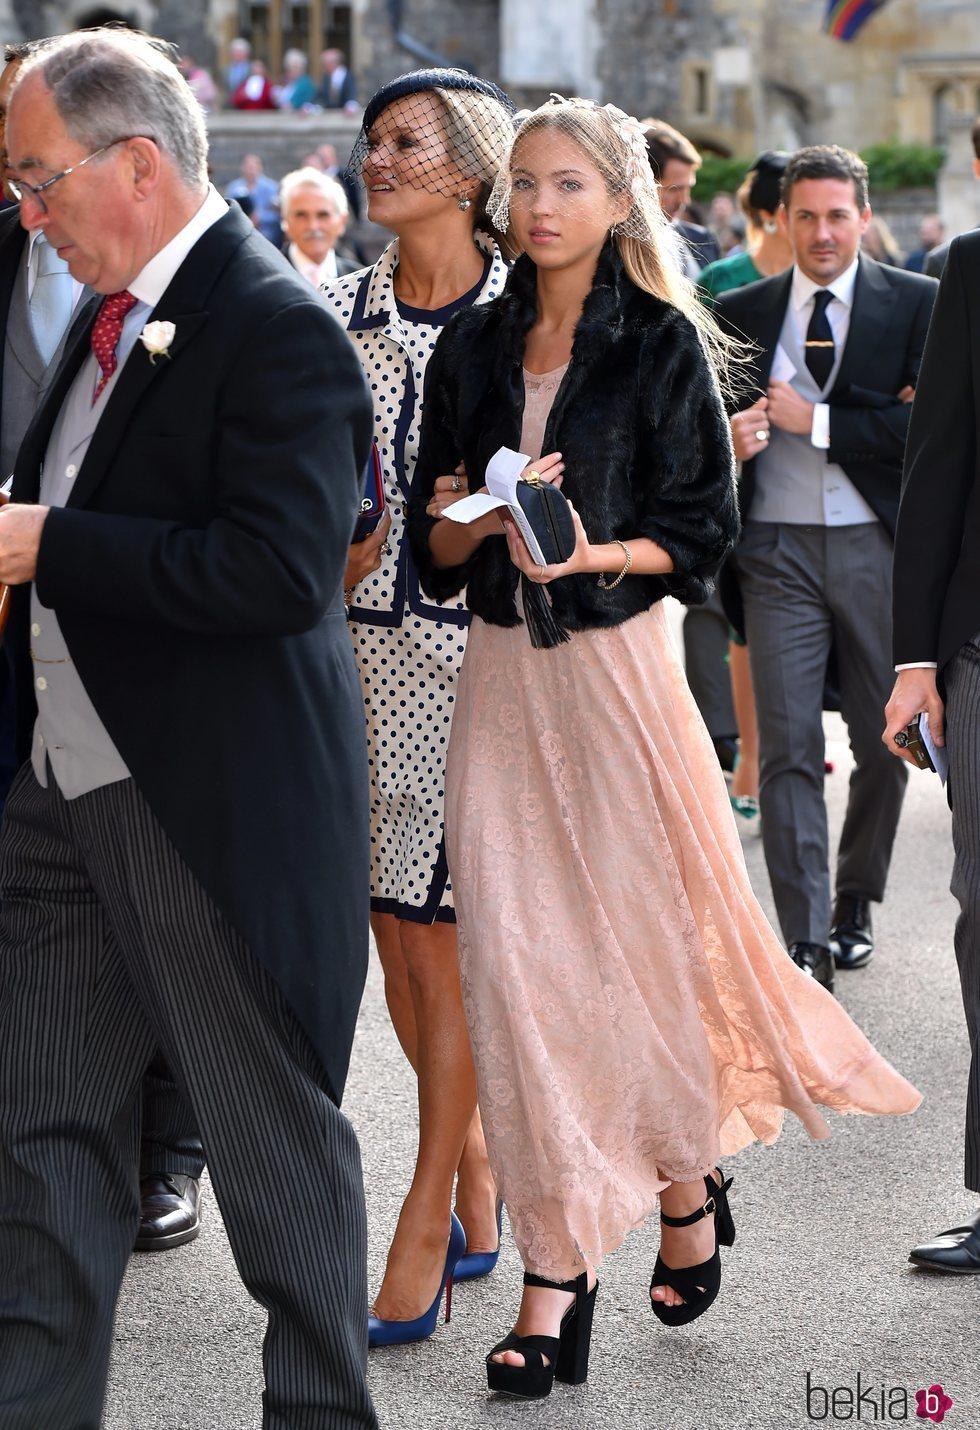 Kate Moss y Lila Grace en la boda de Eugenia de York y Jack Brooksbank